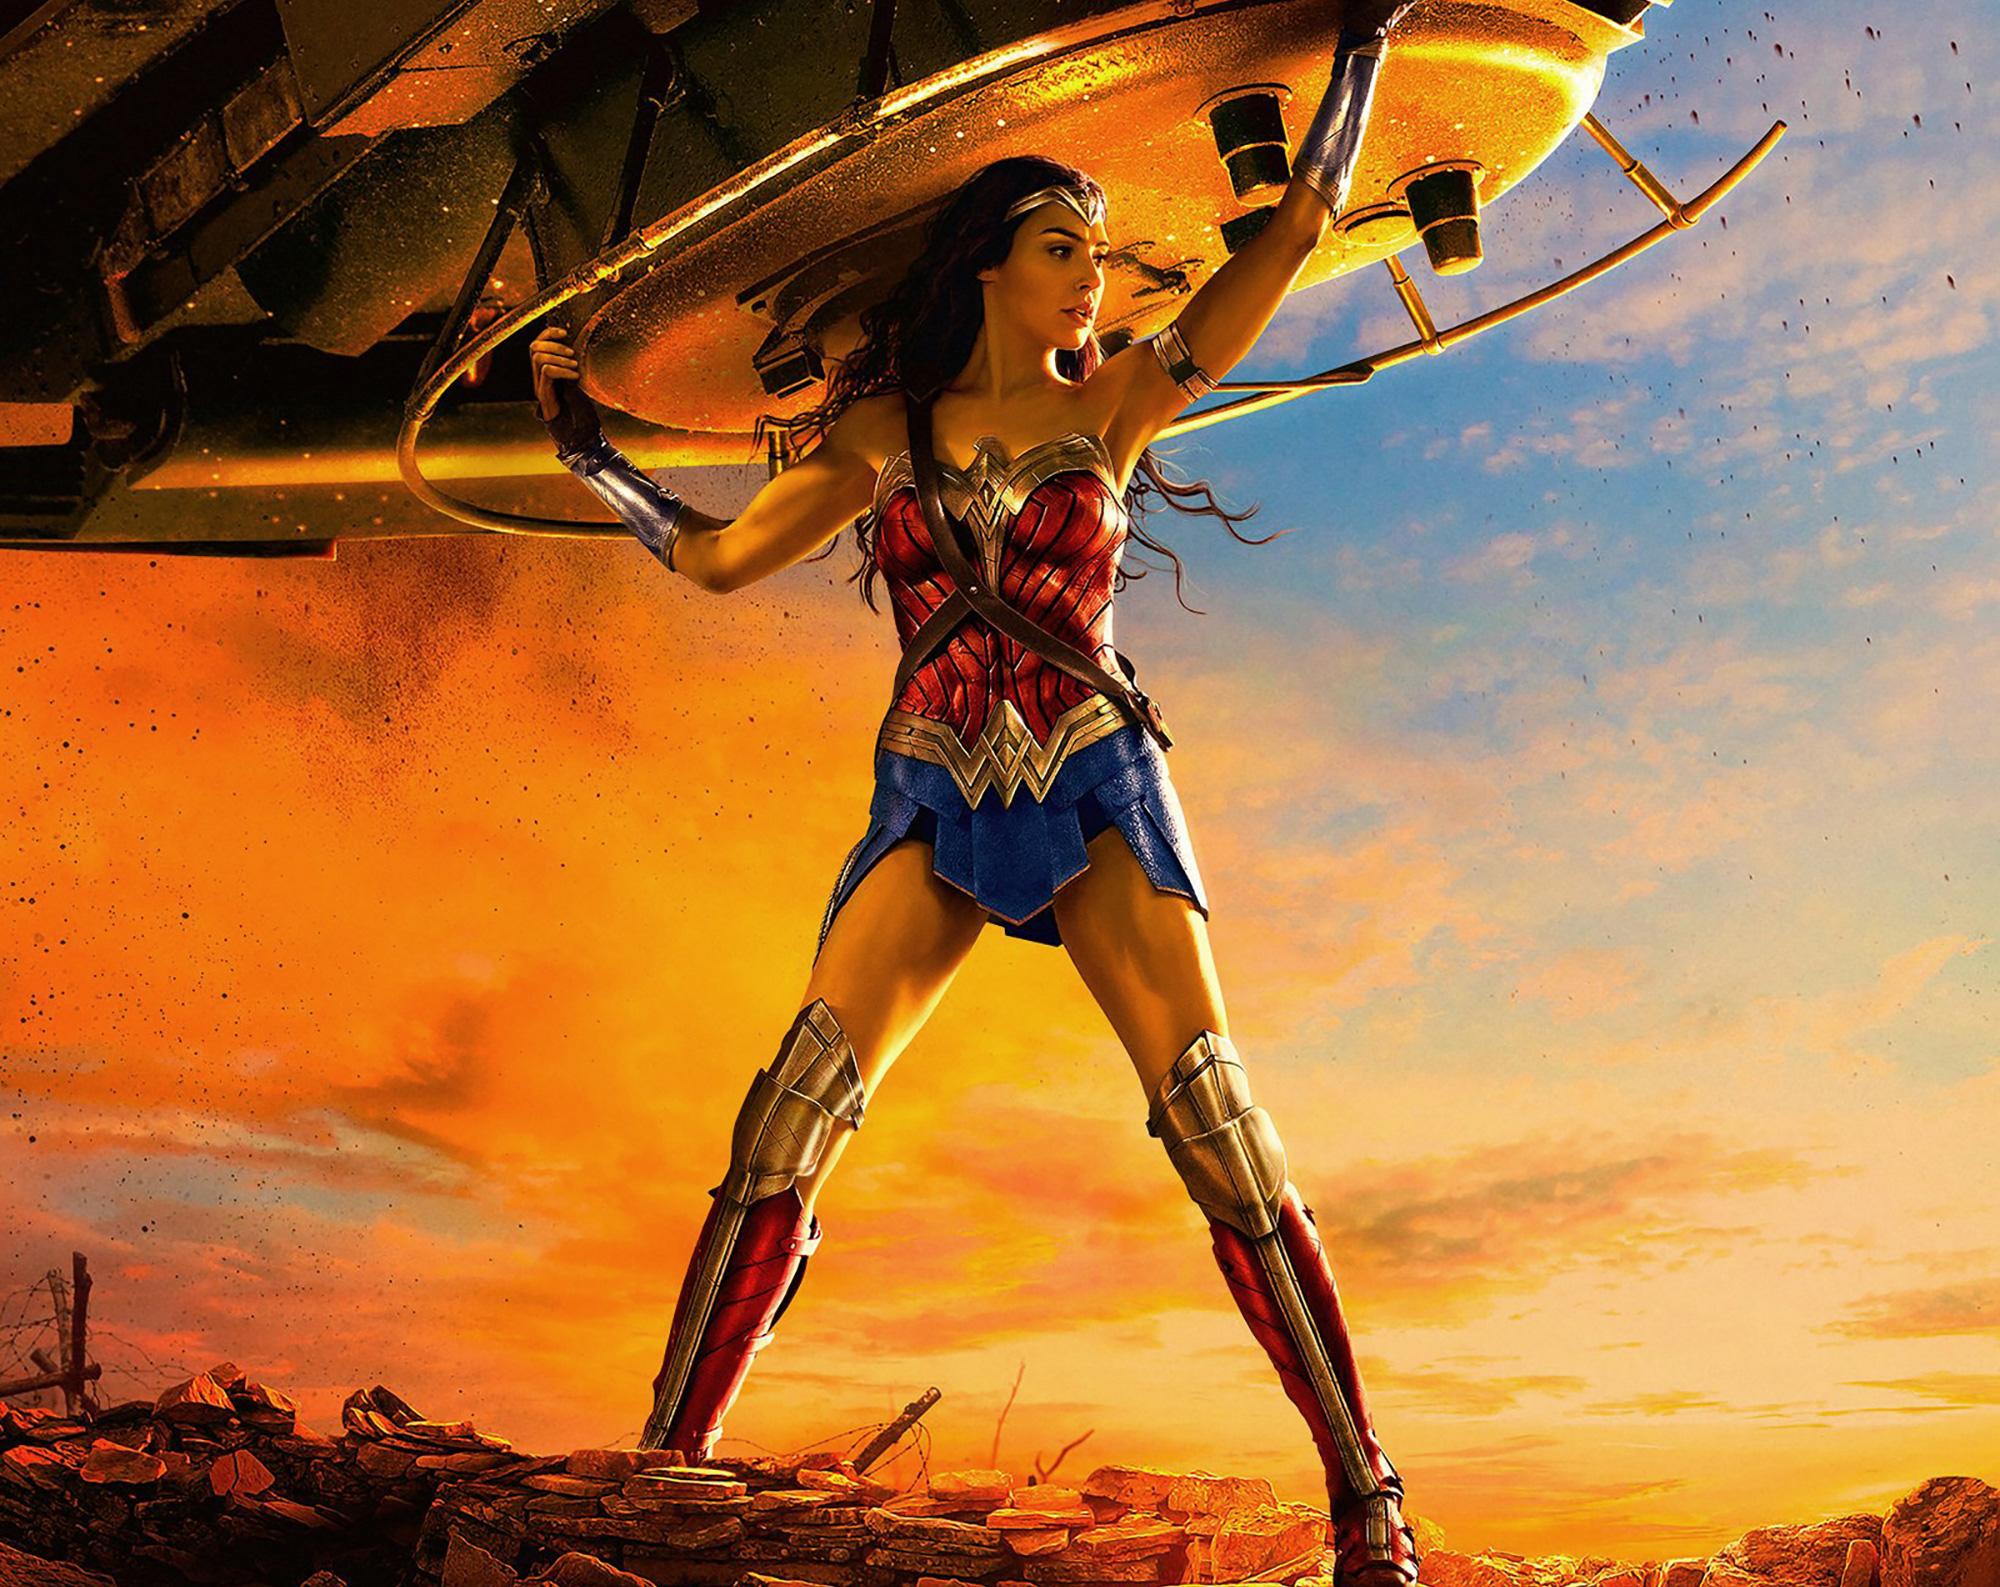 Wonder Woman Movie 2017 Hd Wallpapers: Fondos Wonder Woman, Wallpapers La Mujer Maravilla 2017